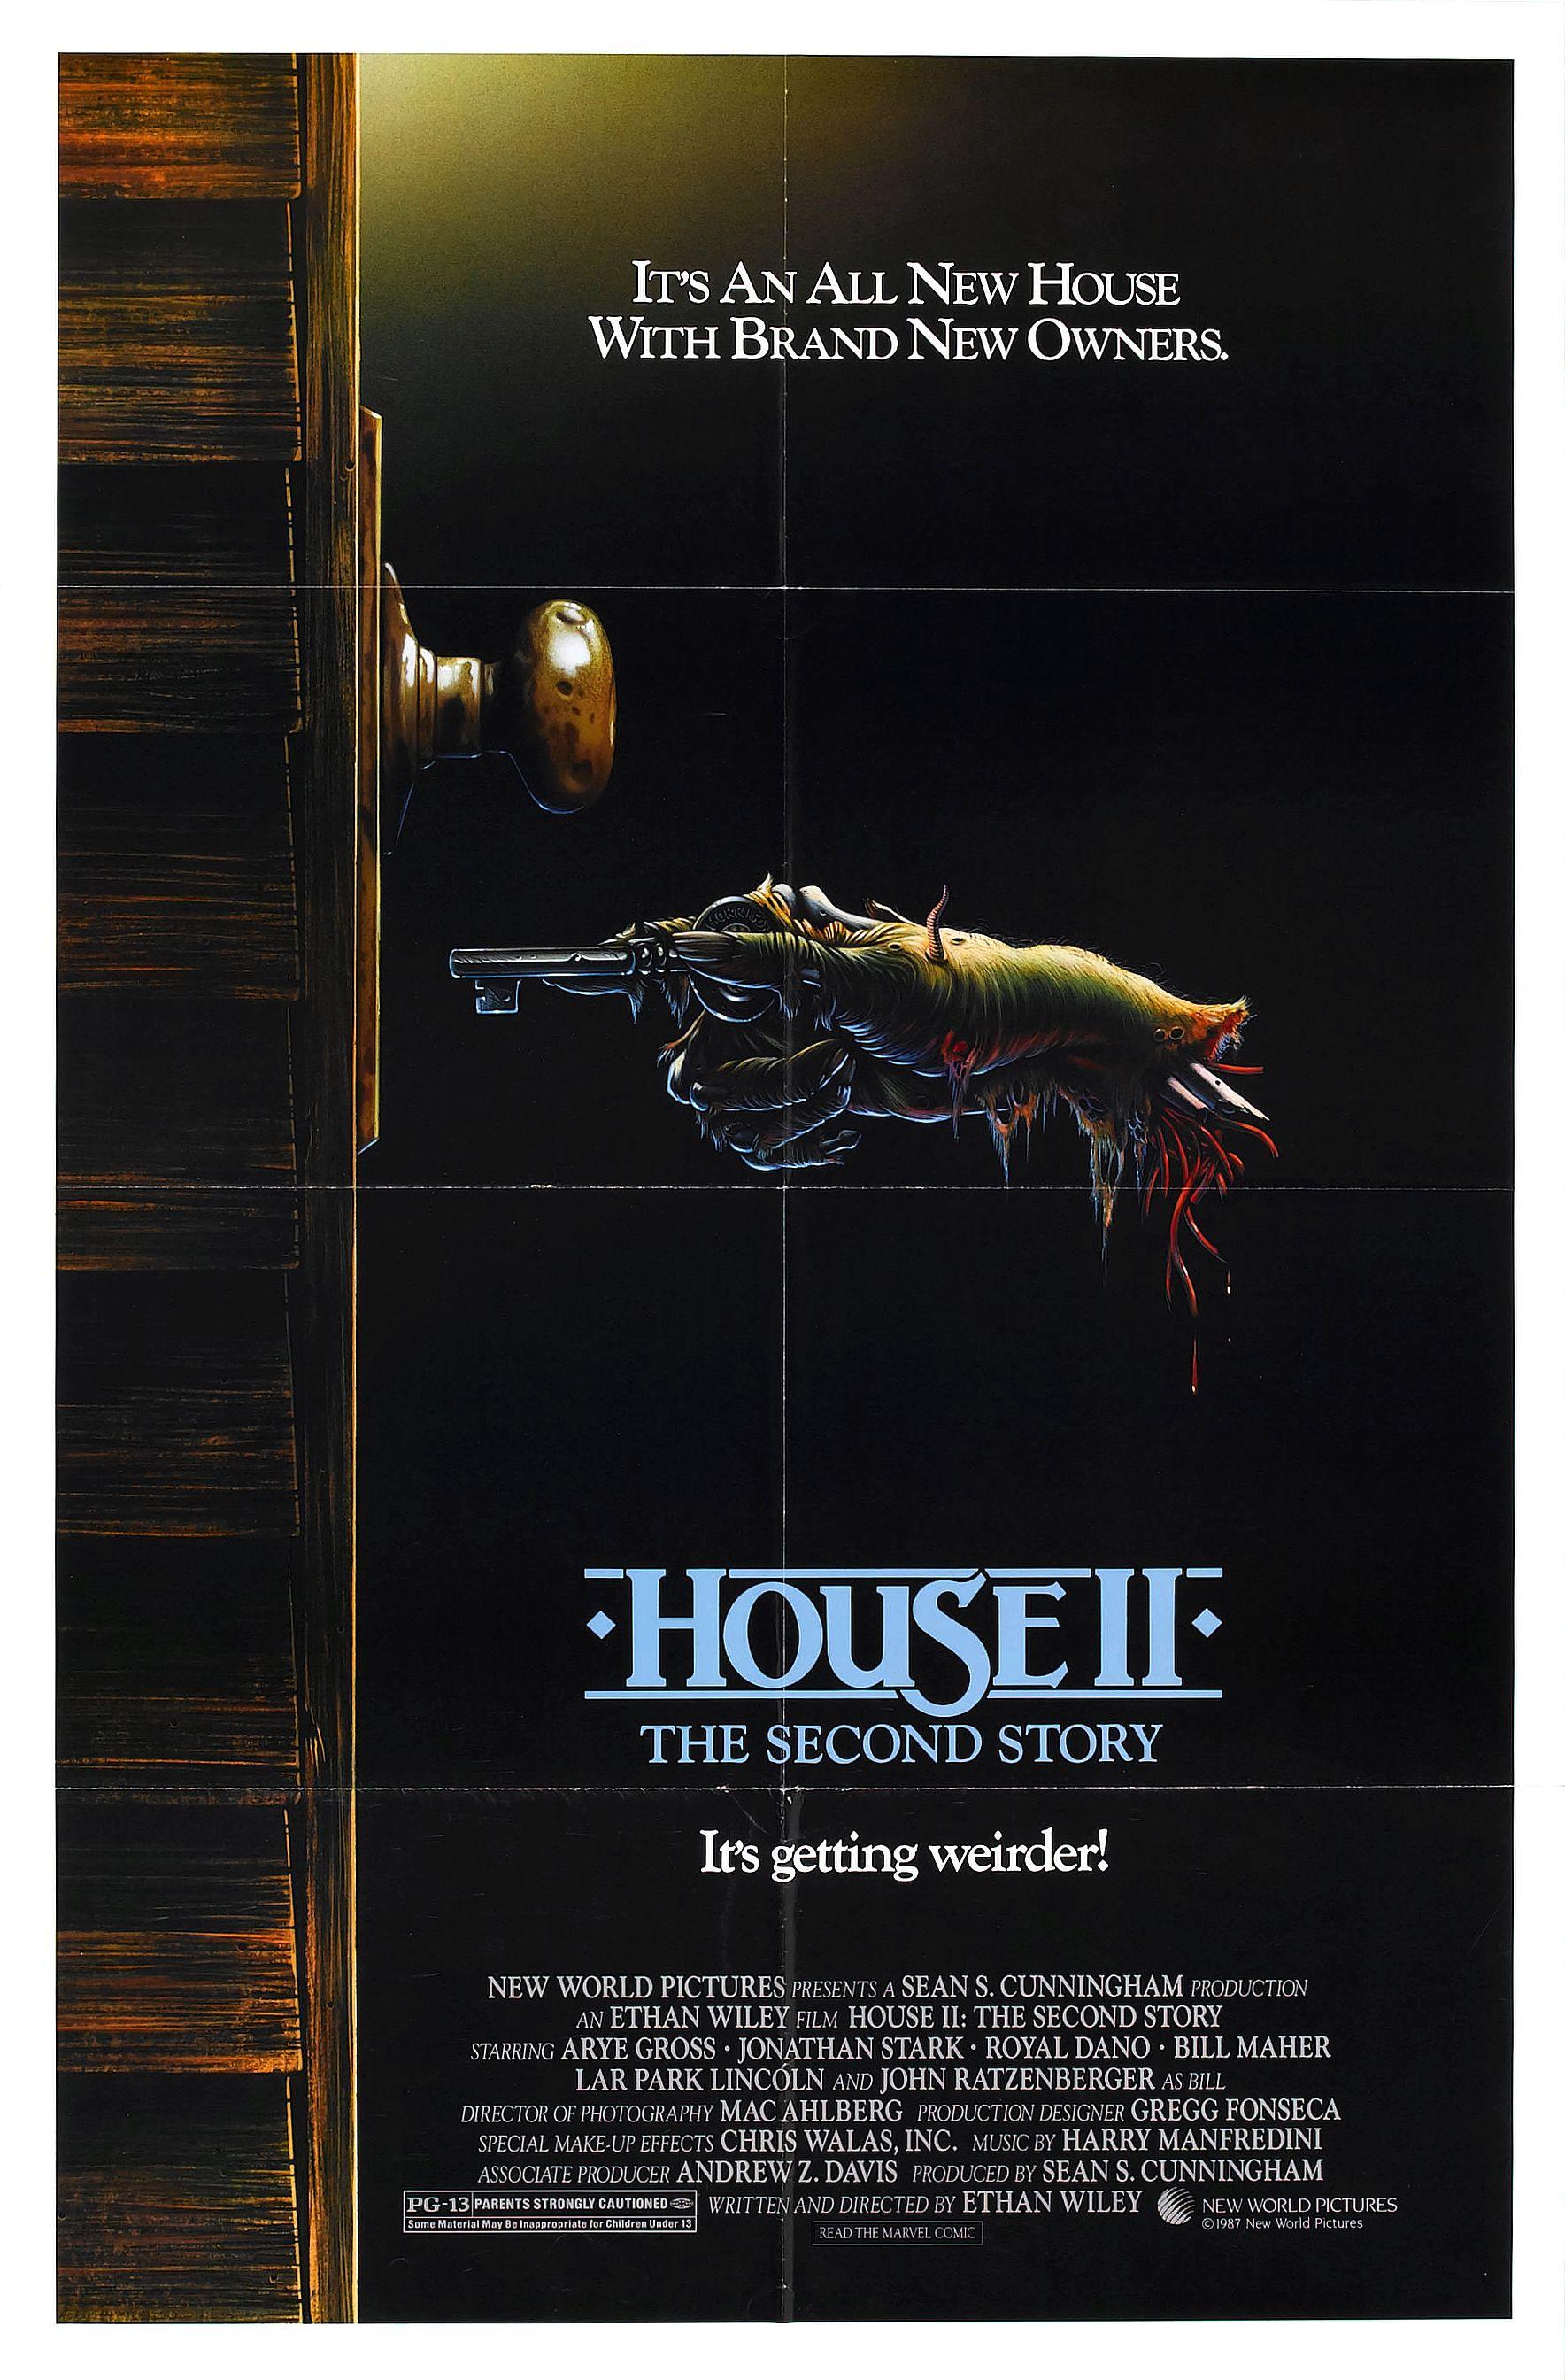 house-2-1kite44house-2-1house-2-10house-2-13house-2-12house-2-9